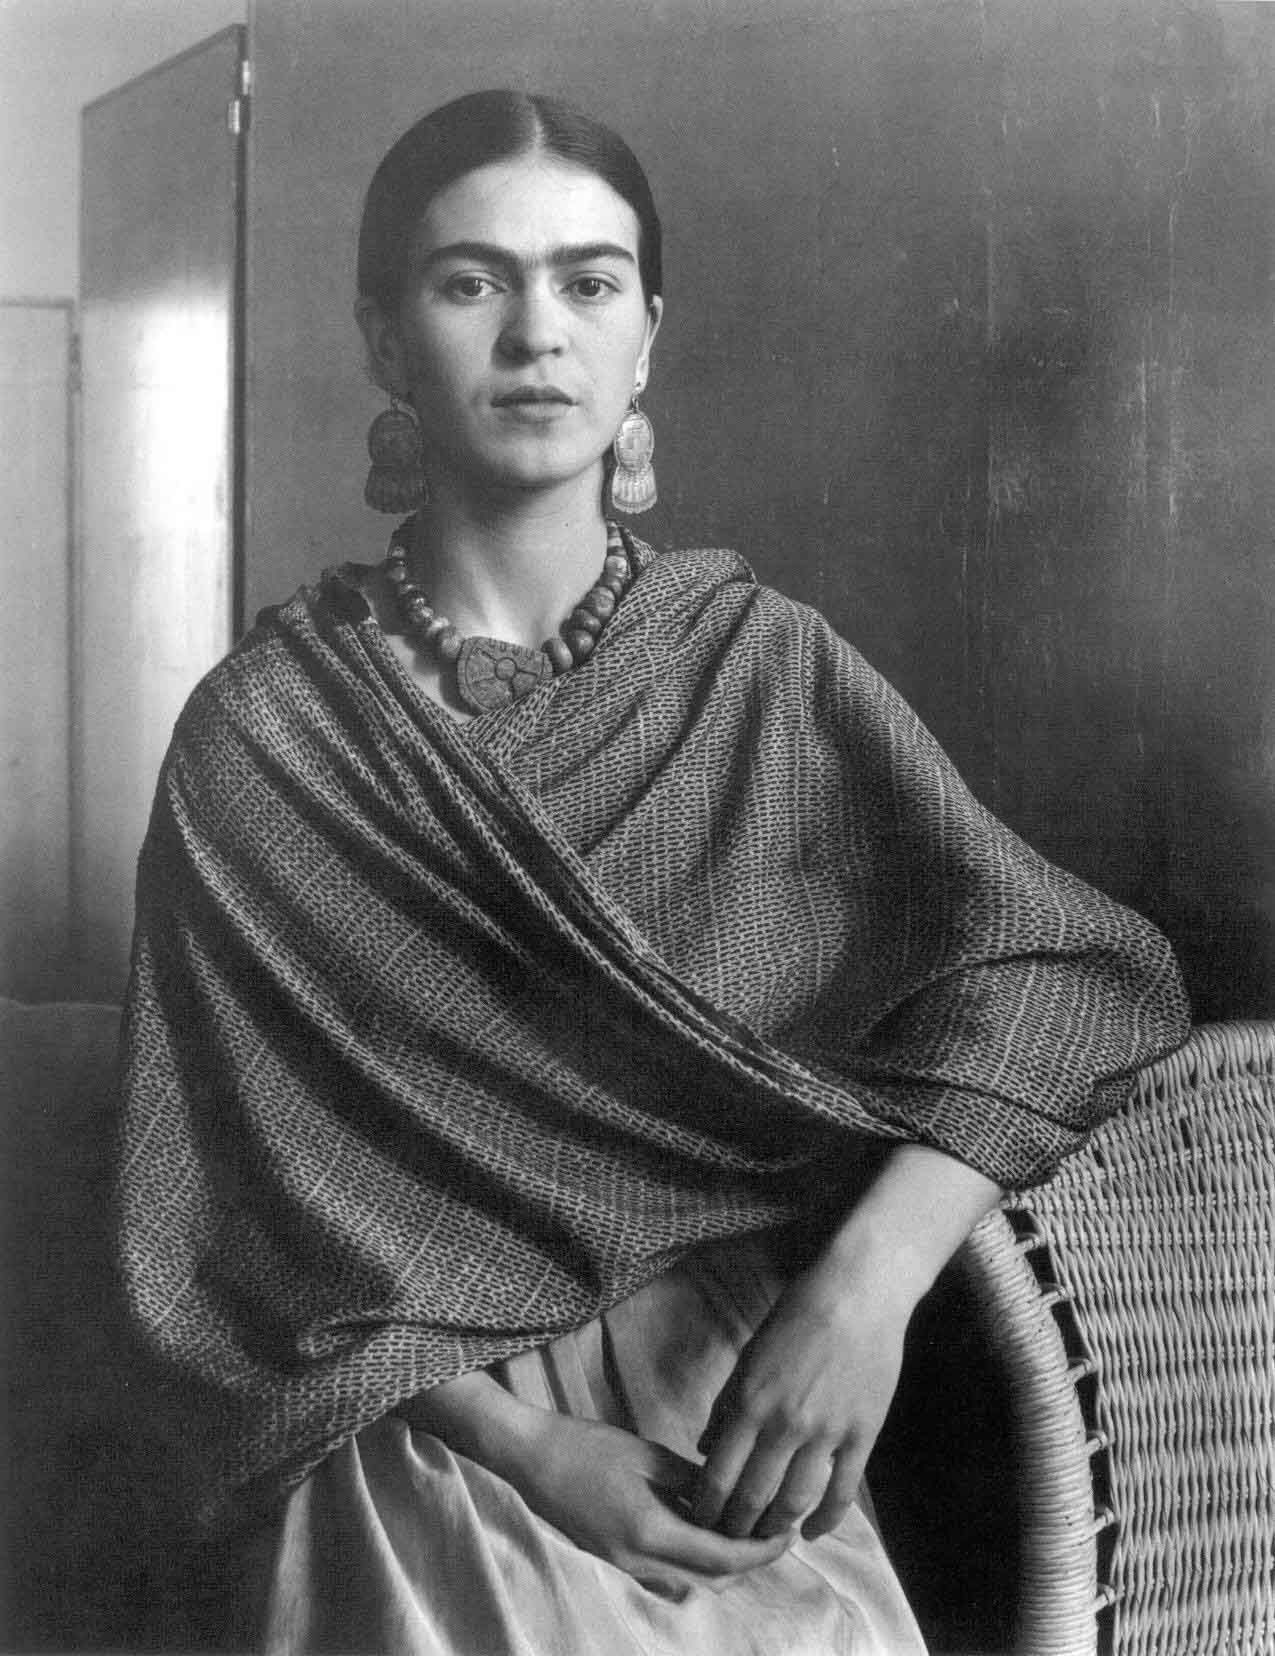 Portrait Of The Artist Frida Kahlo 1931 By Imogen Cunningham